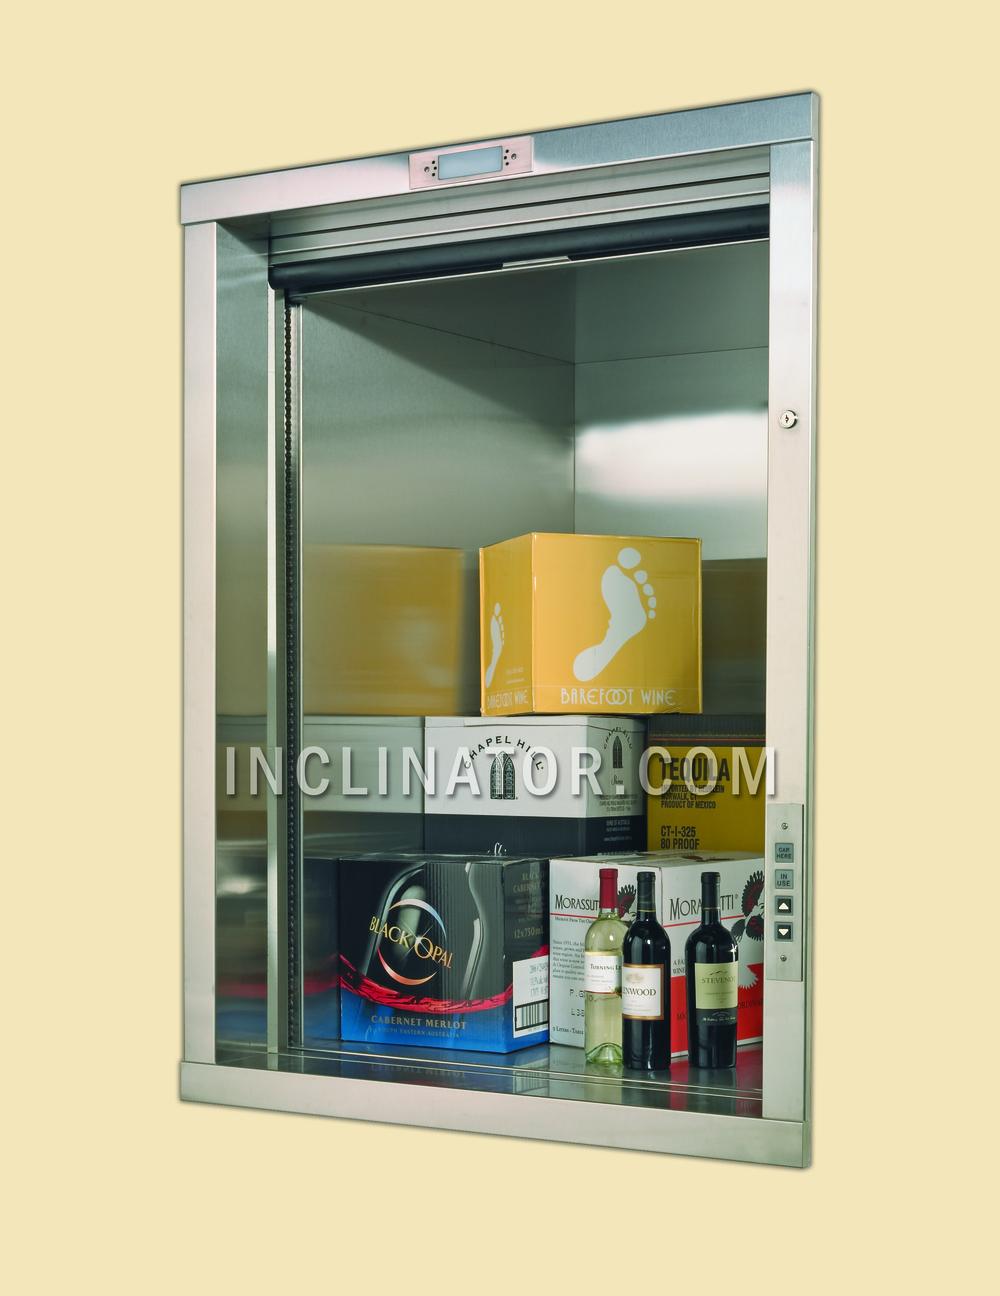 Commercial Dumbwaiter doors